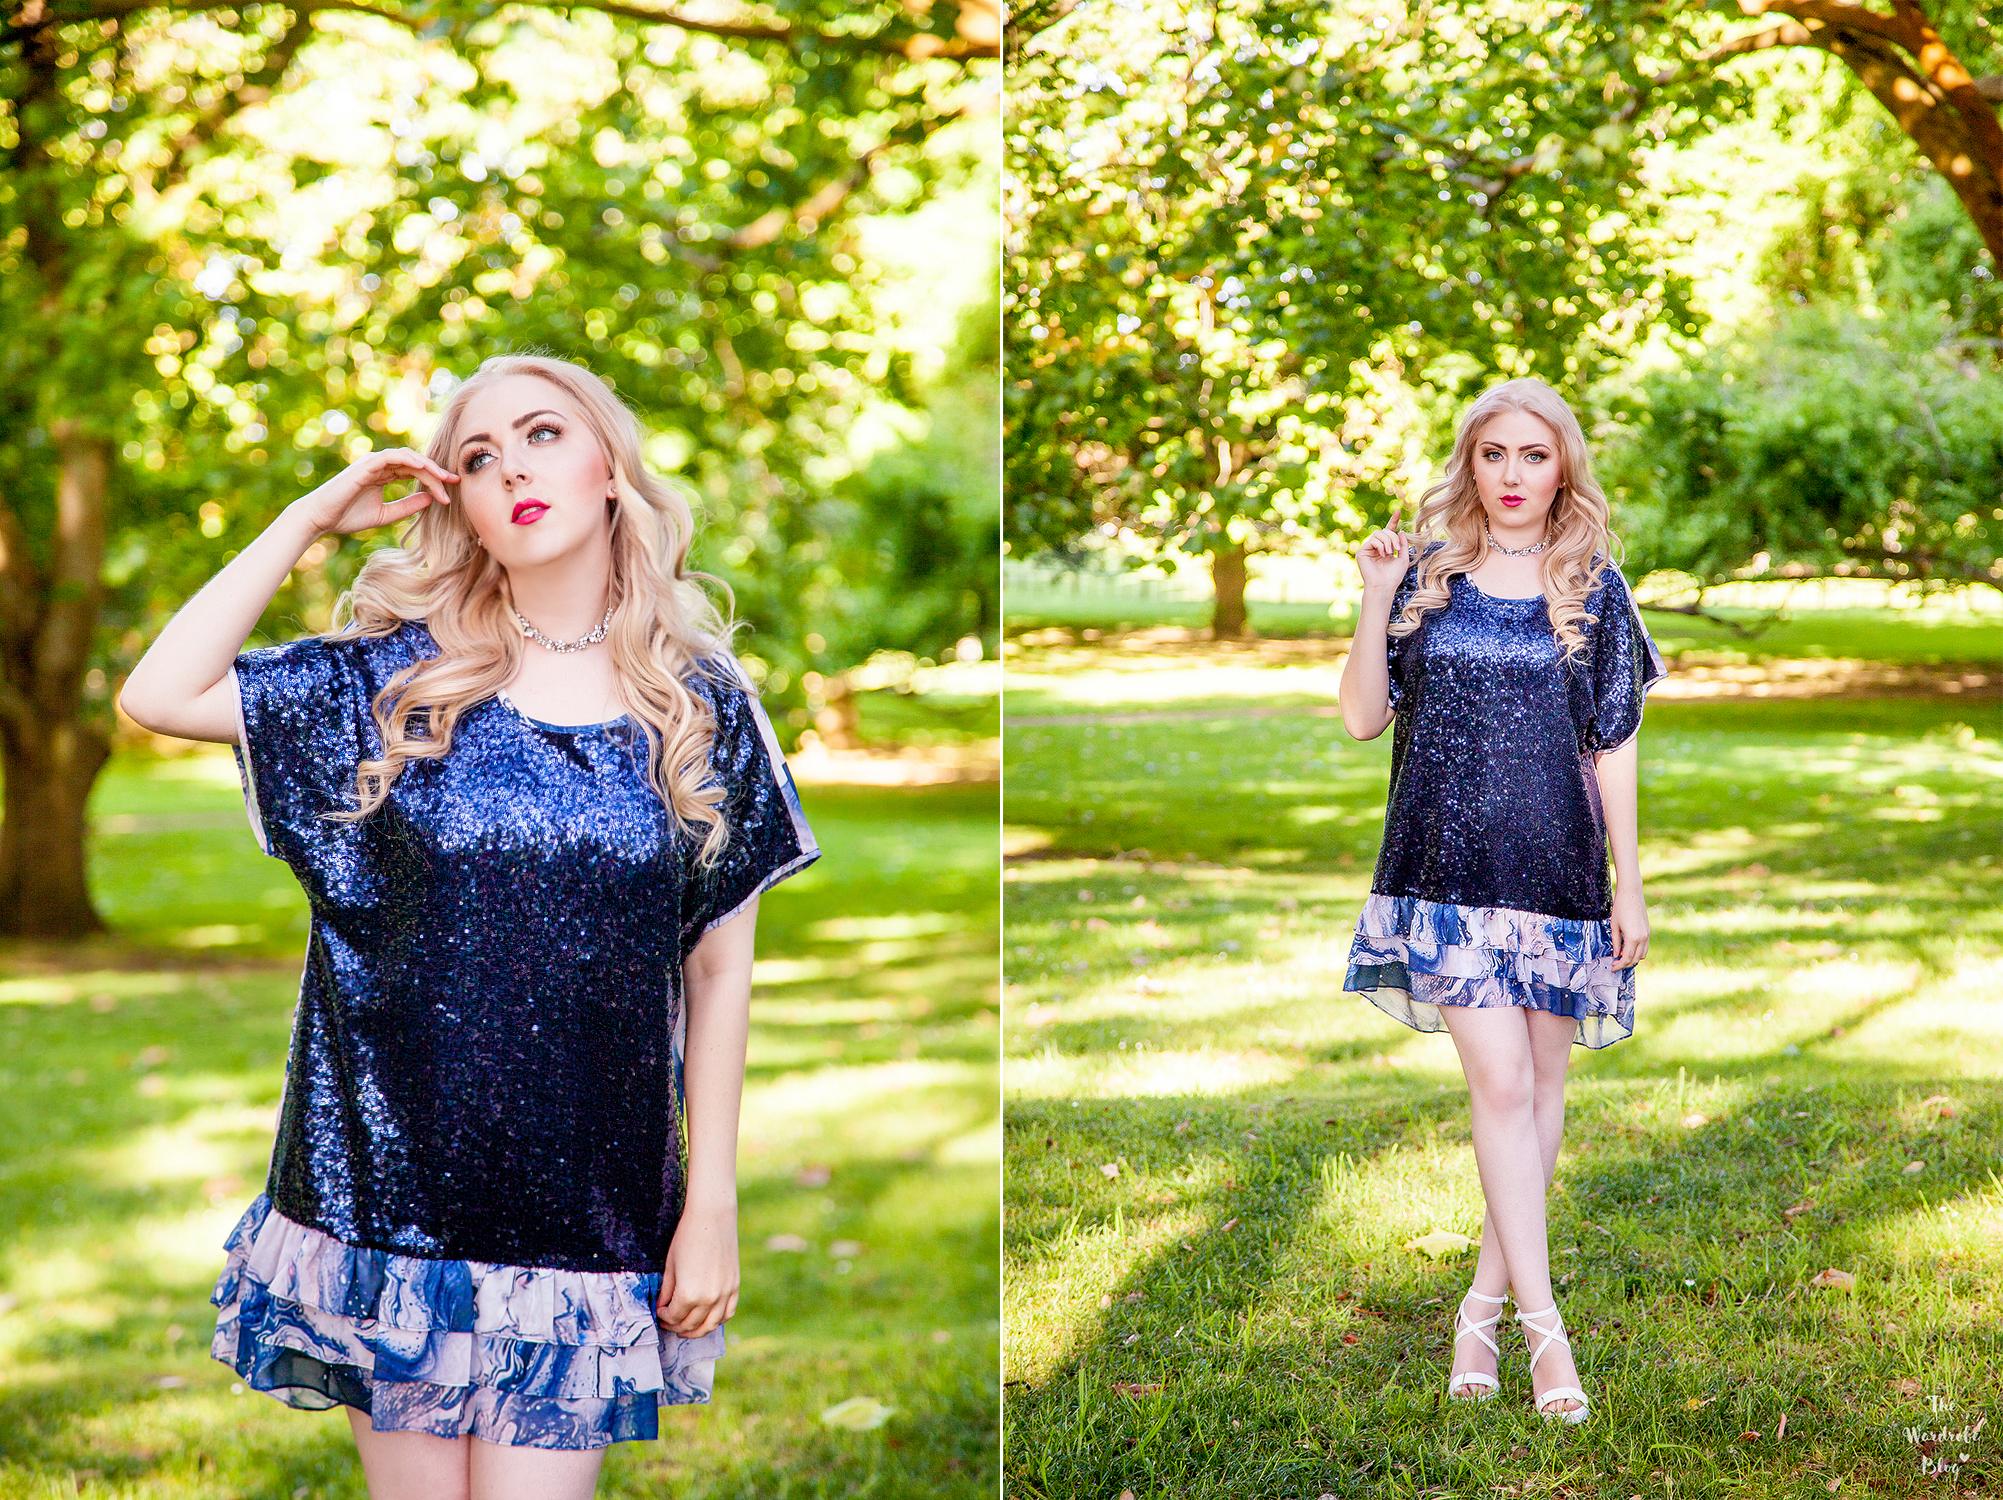 Pia-Boutique-Pair-Blue-Navy-Dress-Marble